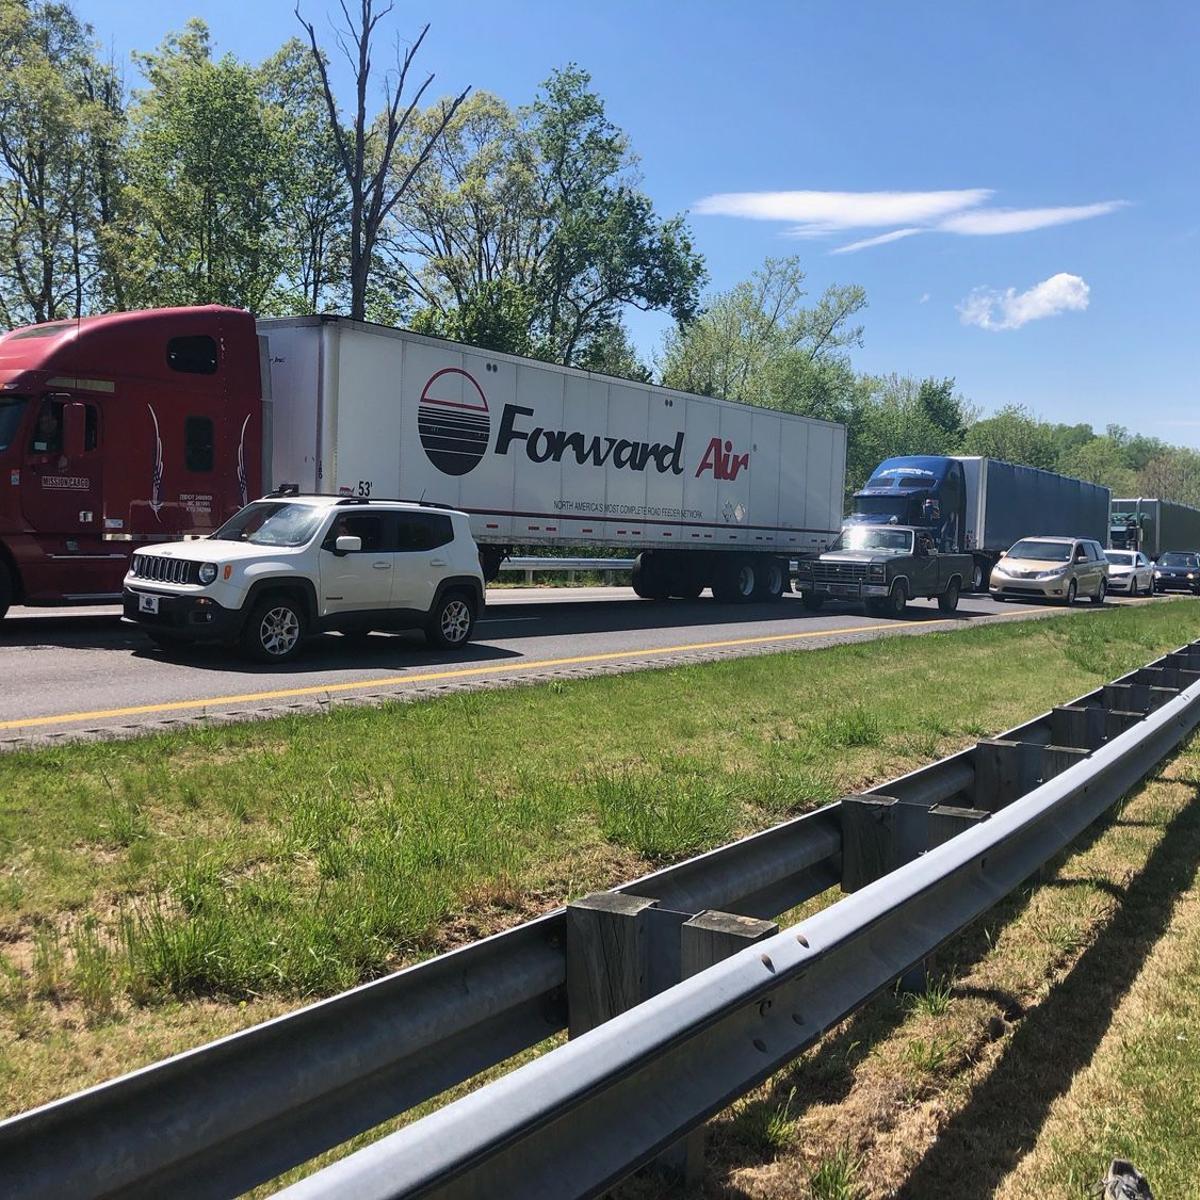 Wreck slows traffic on I-40 eastbound | News | morganton com